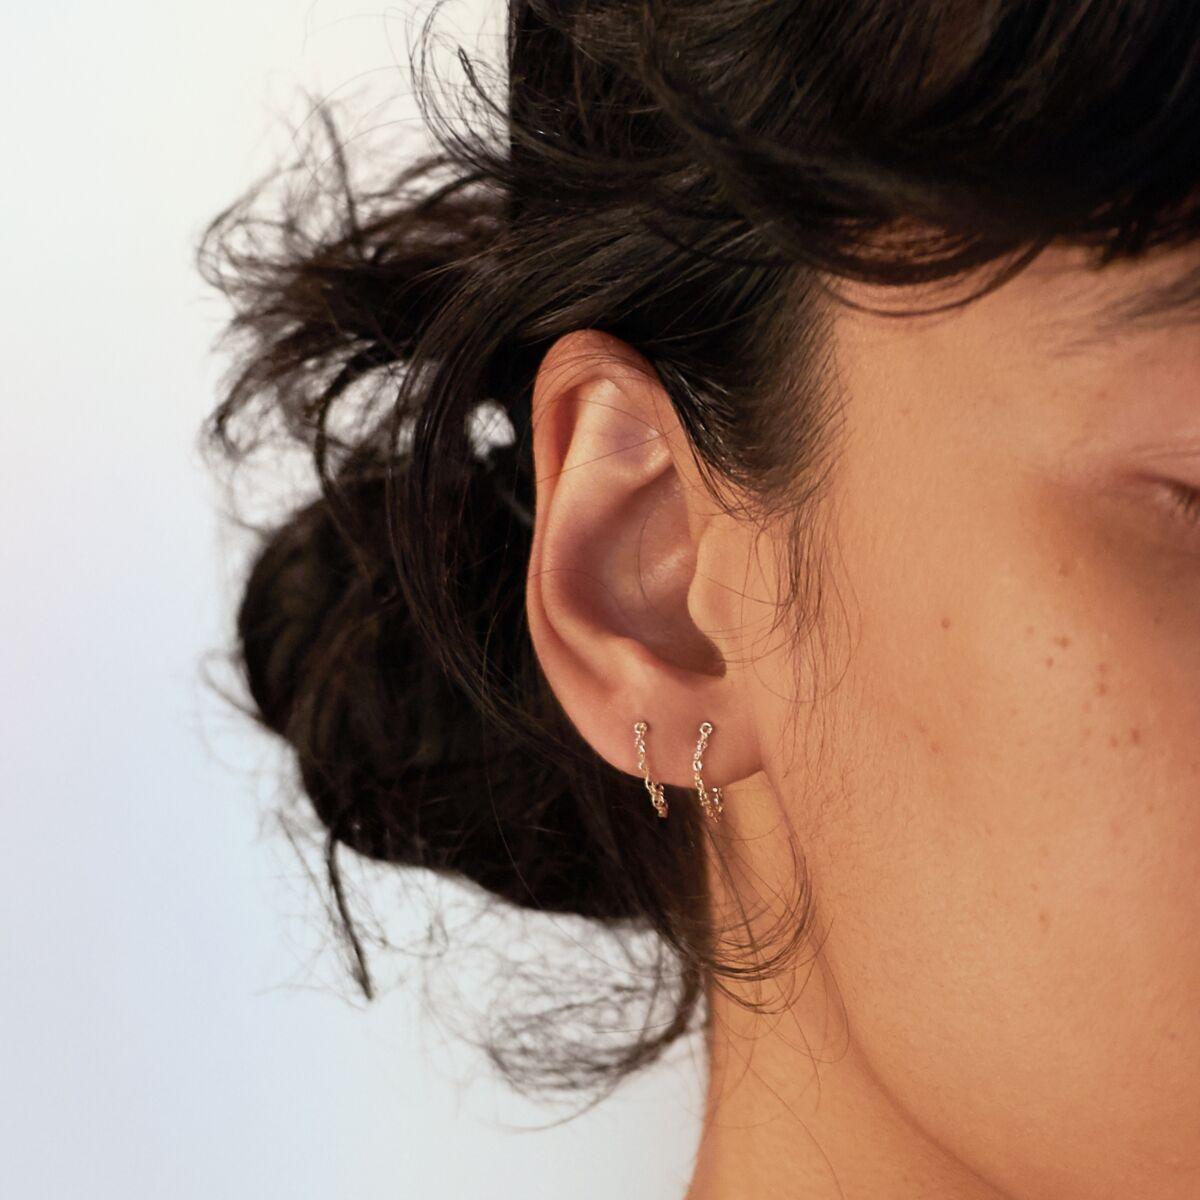 Sweet Nothing Earring (Single) image